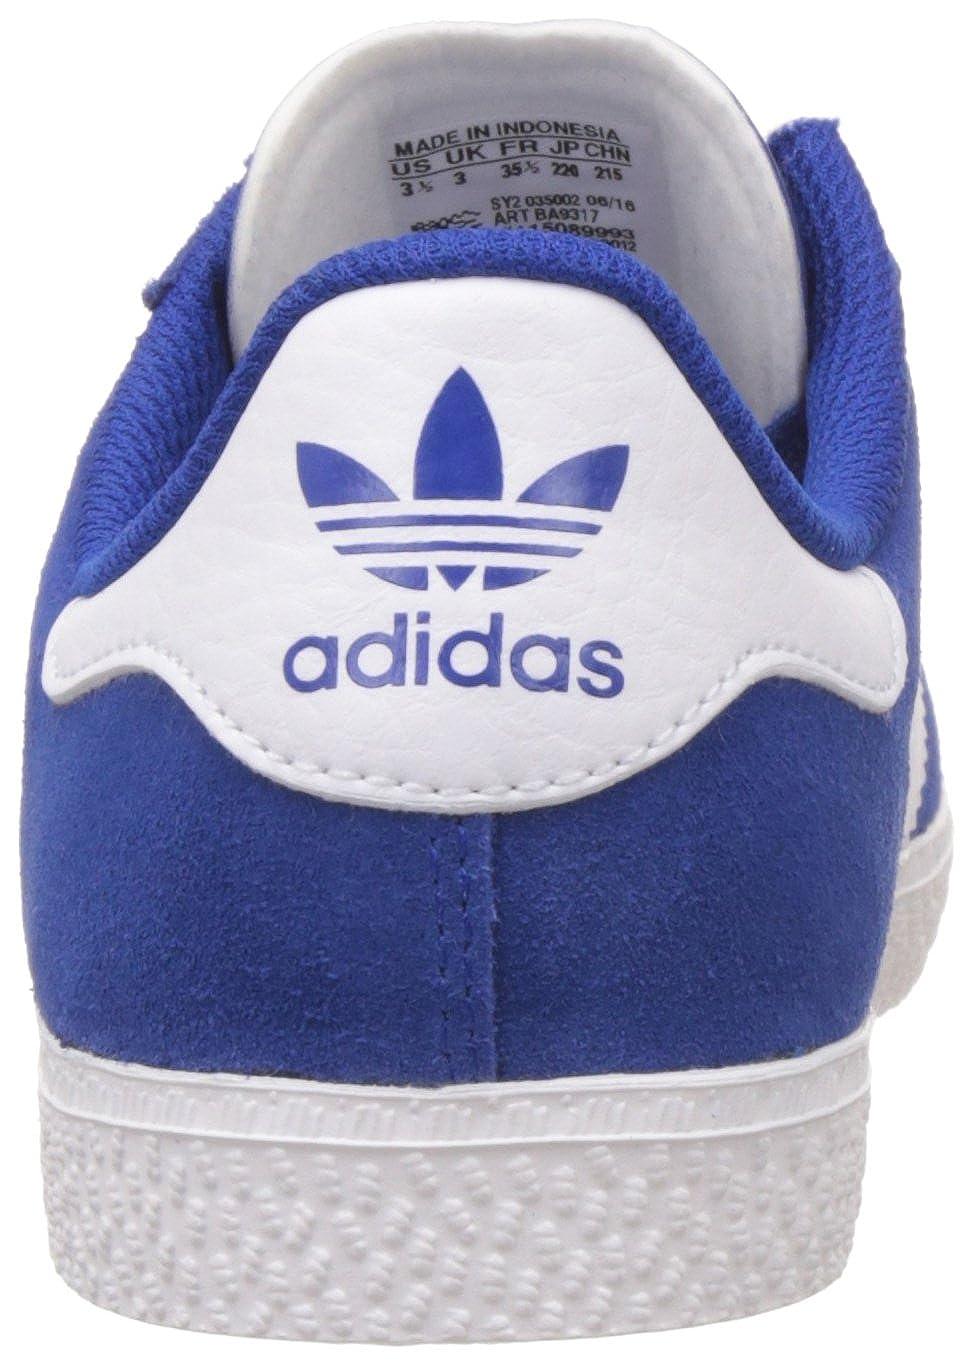 brand new dfe55 8867c Amazon.com  adidas Originals Gazelle 2 J Kids Sneaker Blue BA9317, Size36  23  Sneakers